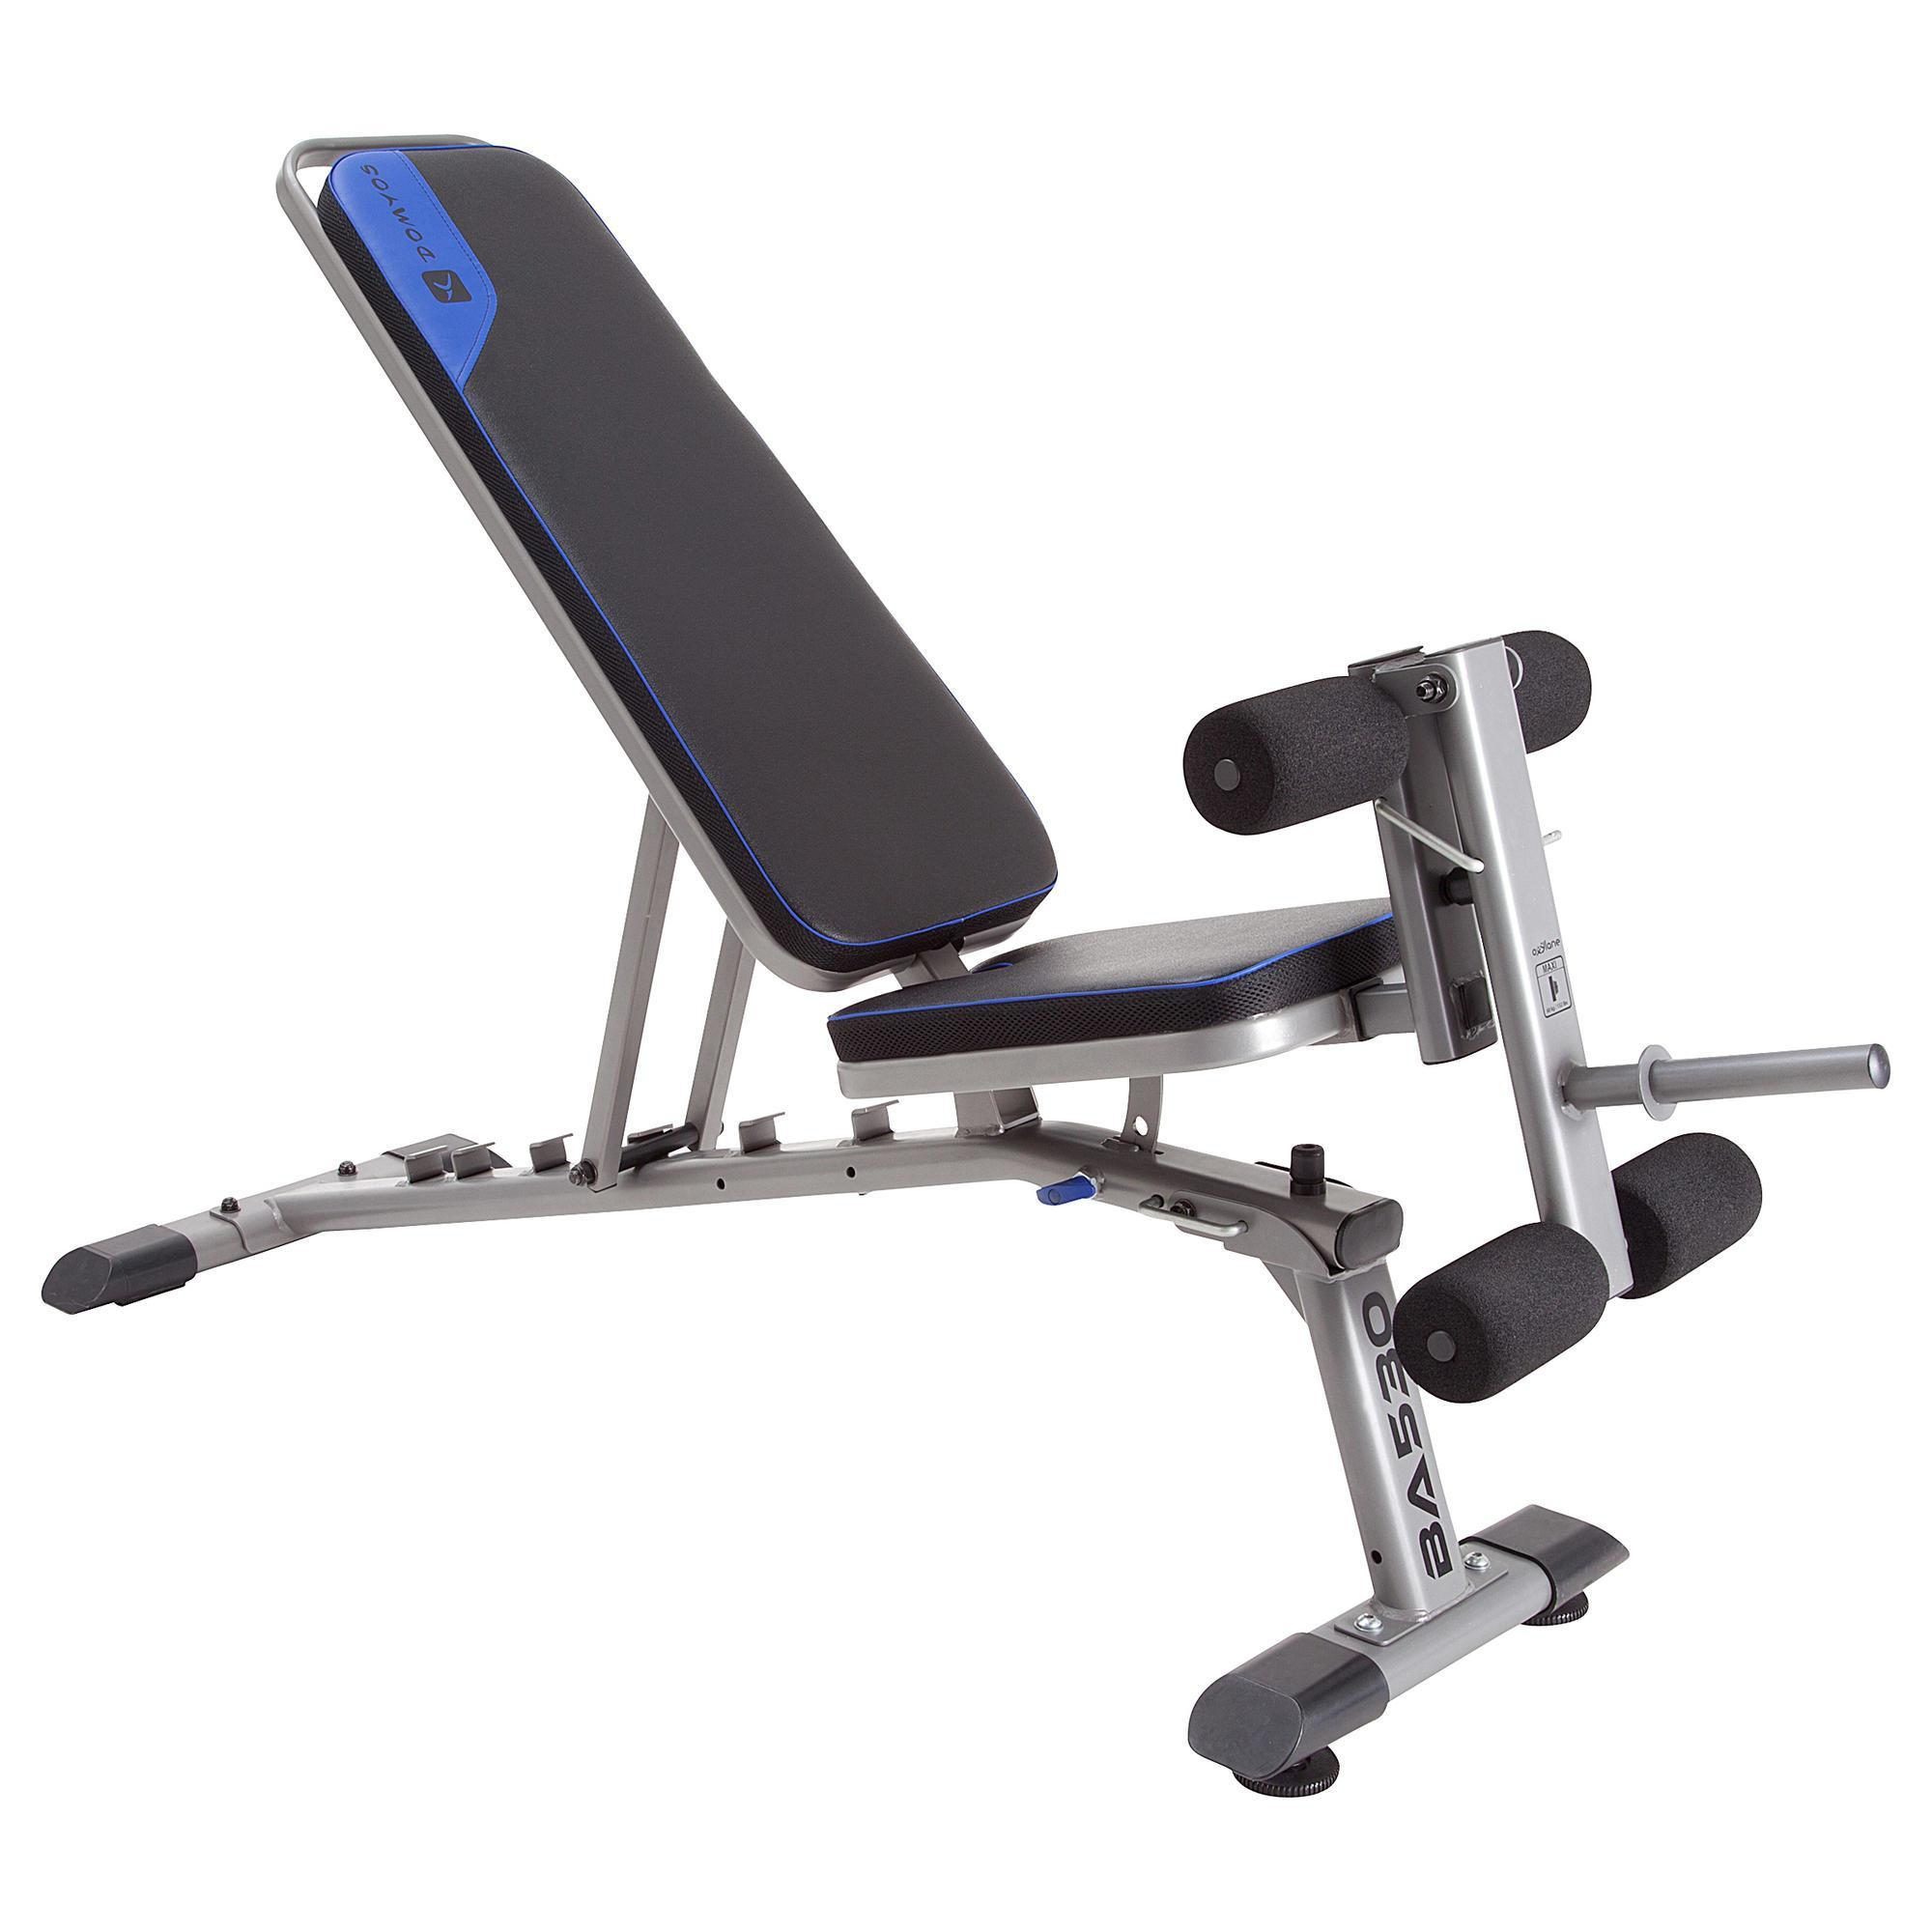 Bancs de musculation | Decathlon on